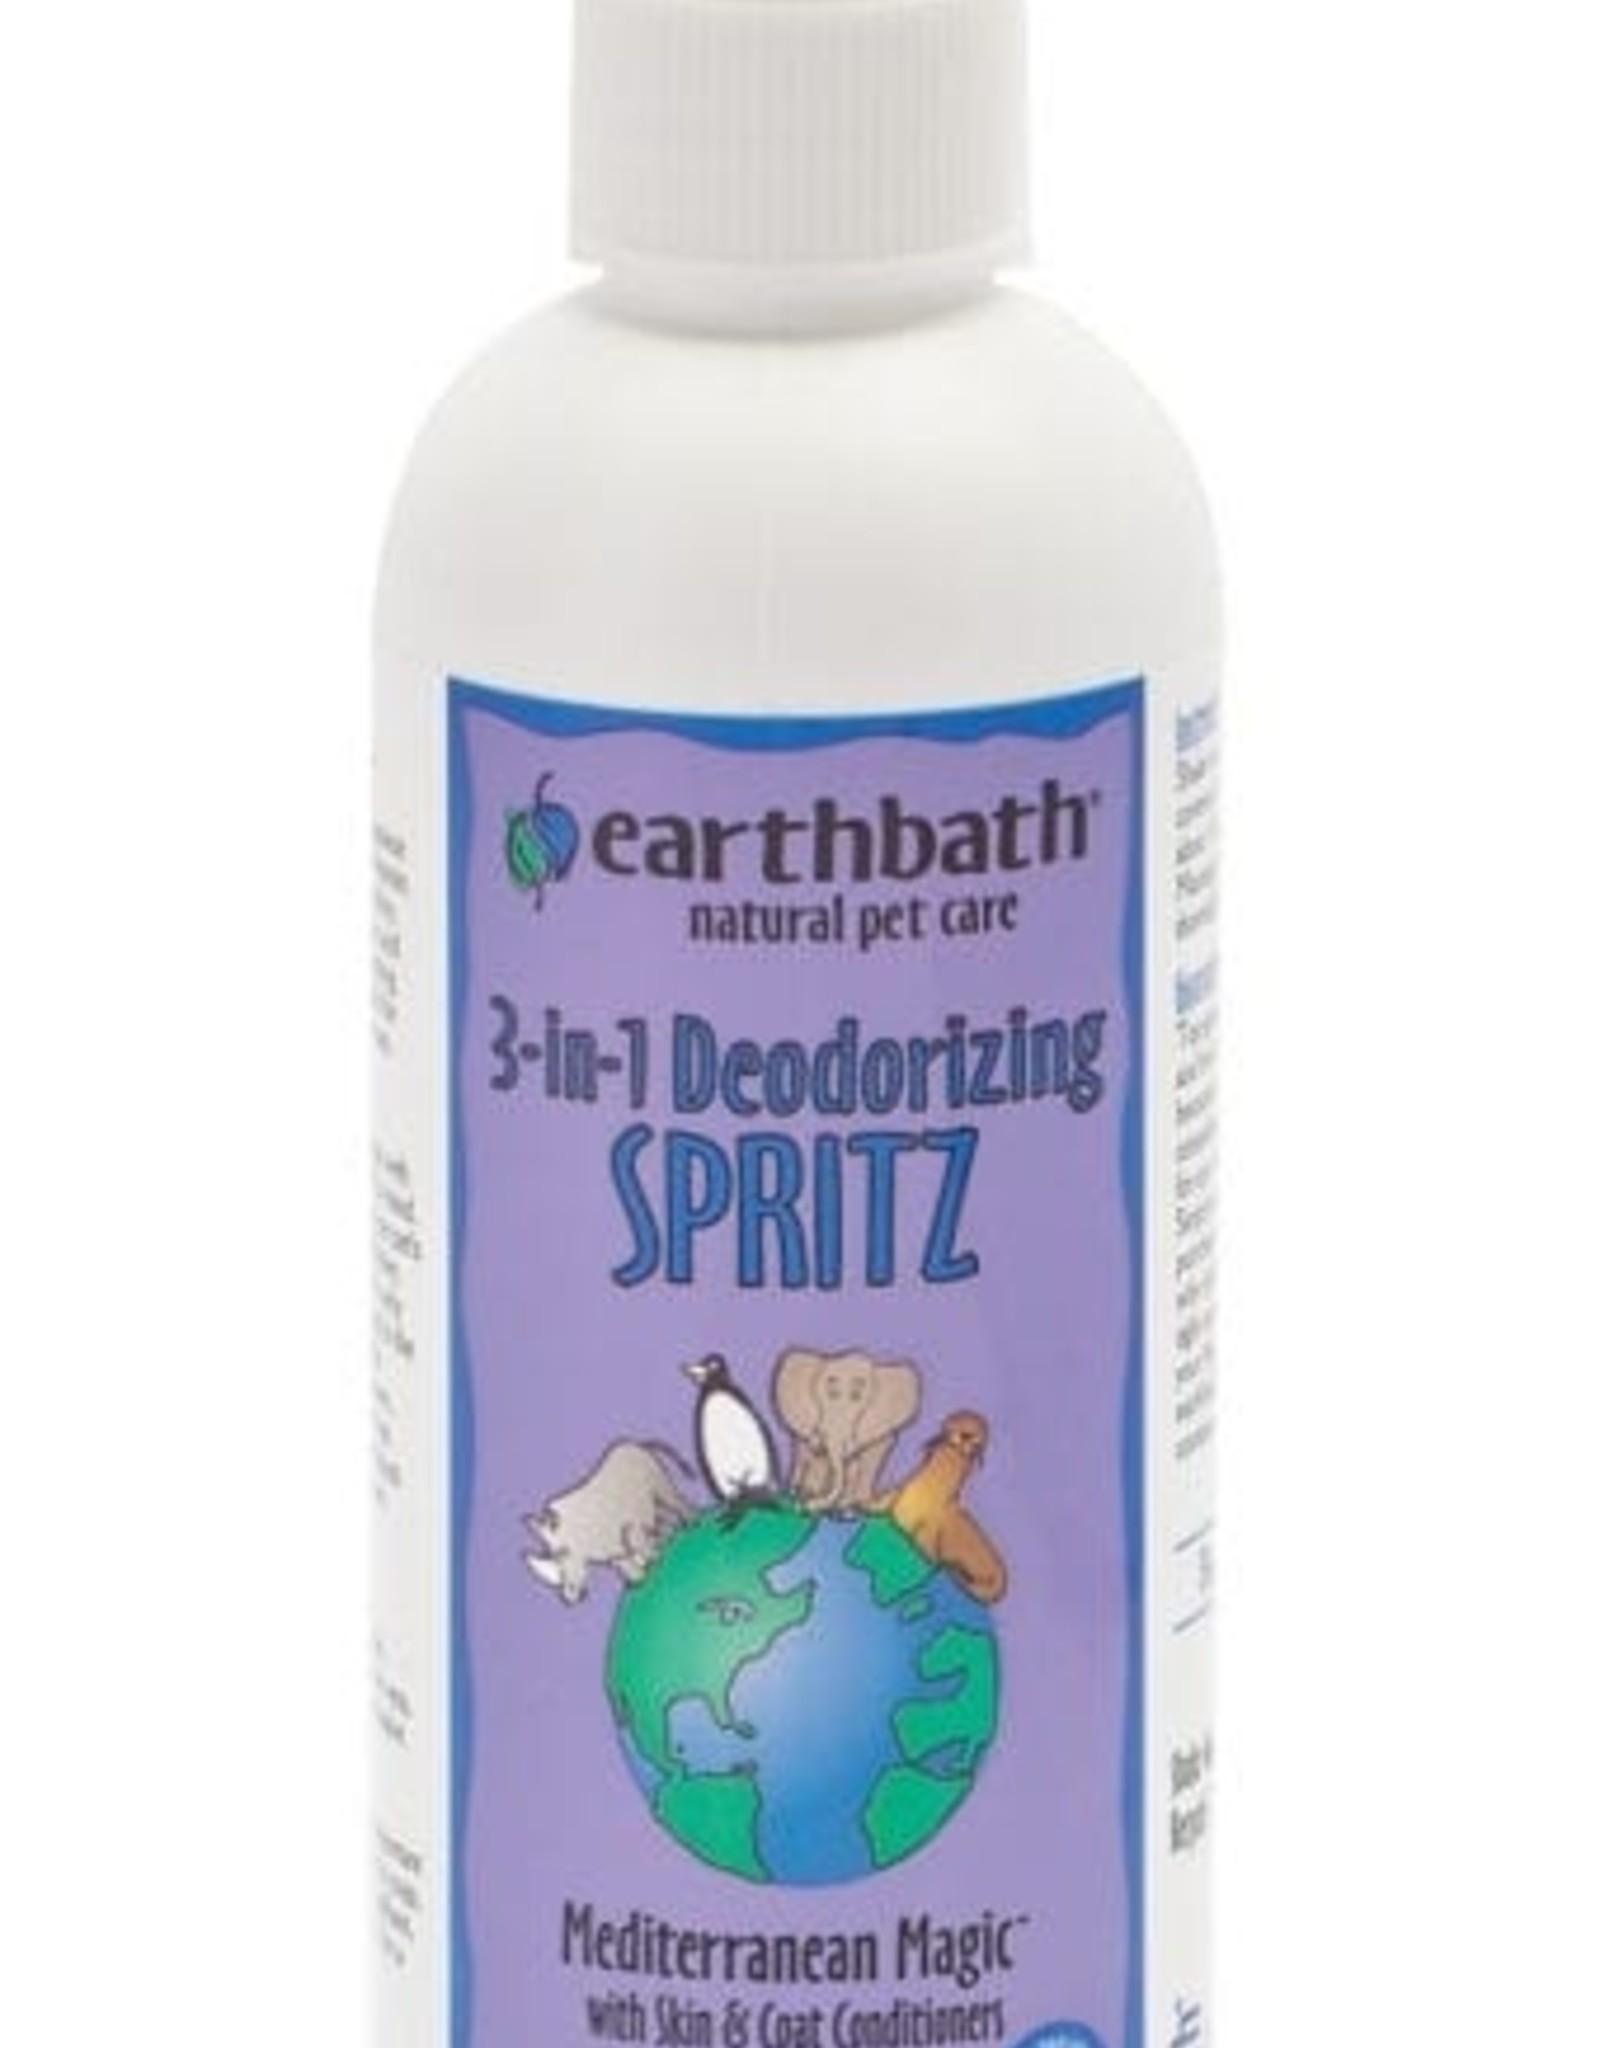 earthbath Mediterranean Magic Deodorizing Spritz - 8oz